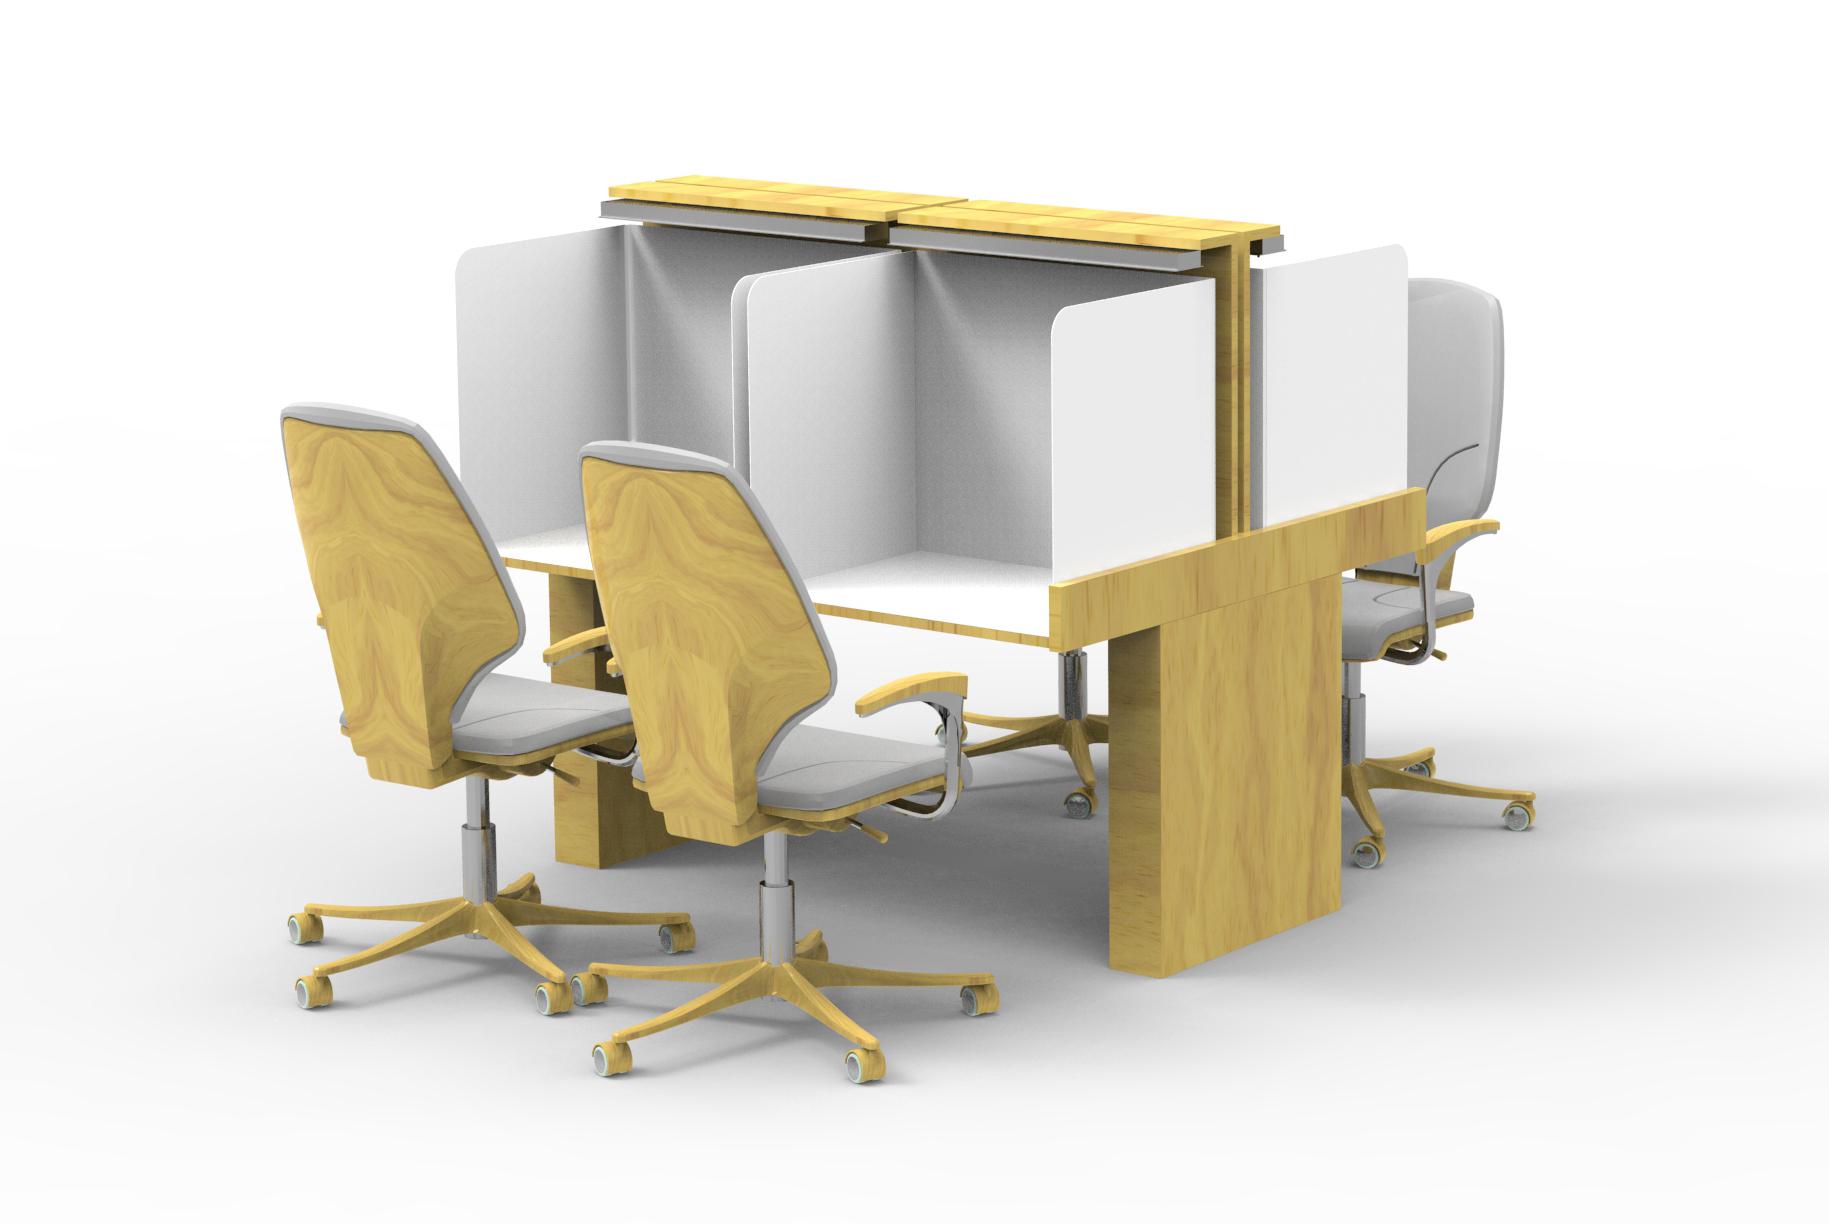 Table Lab-4 seats